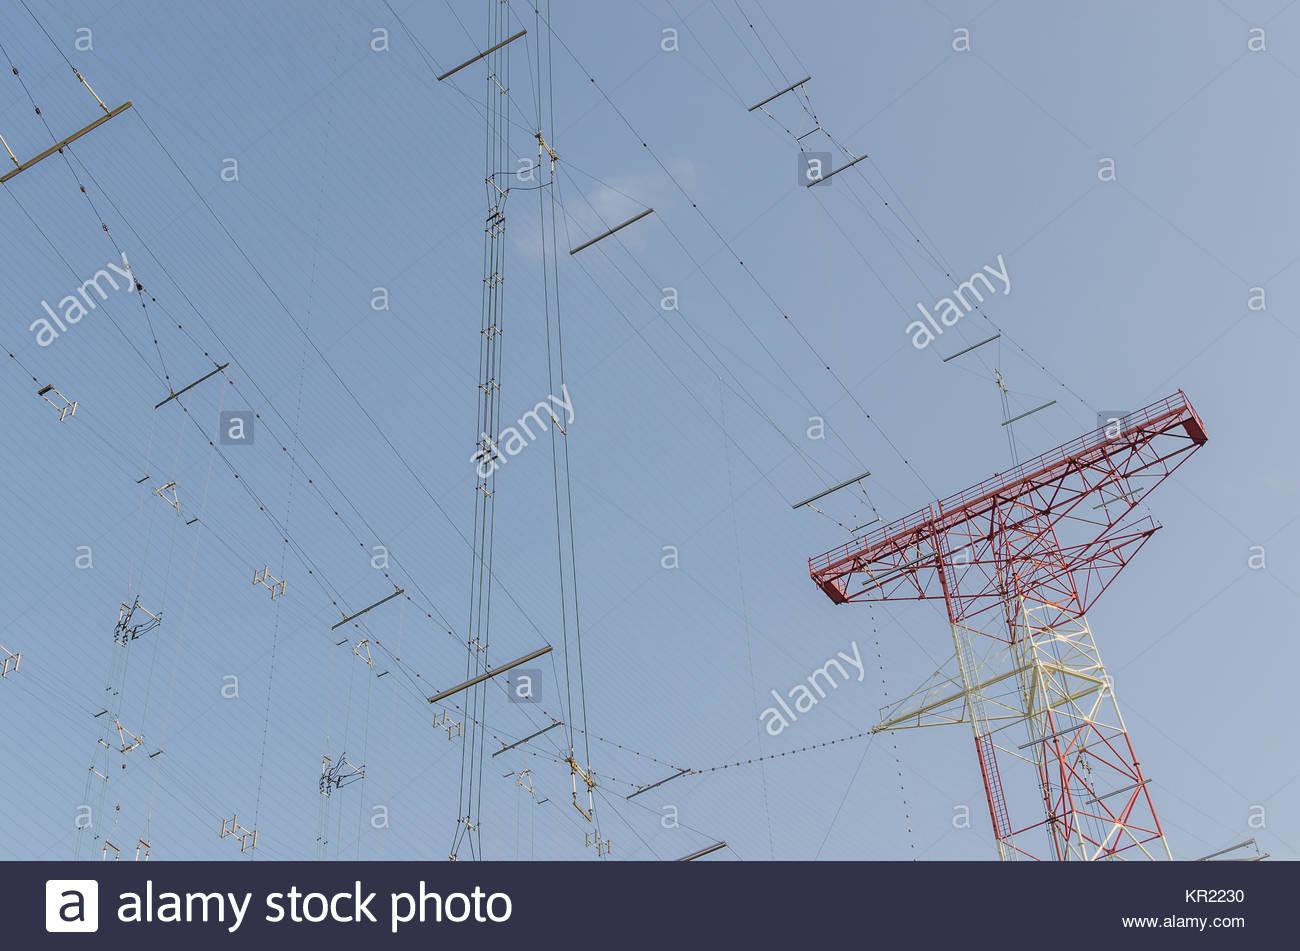 communication lines by transmitting plant Stock Photo